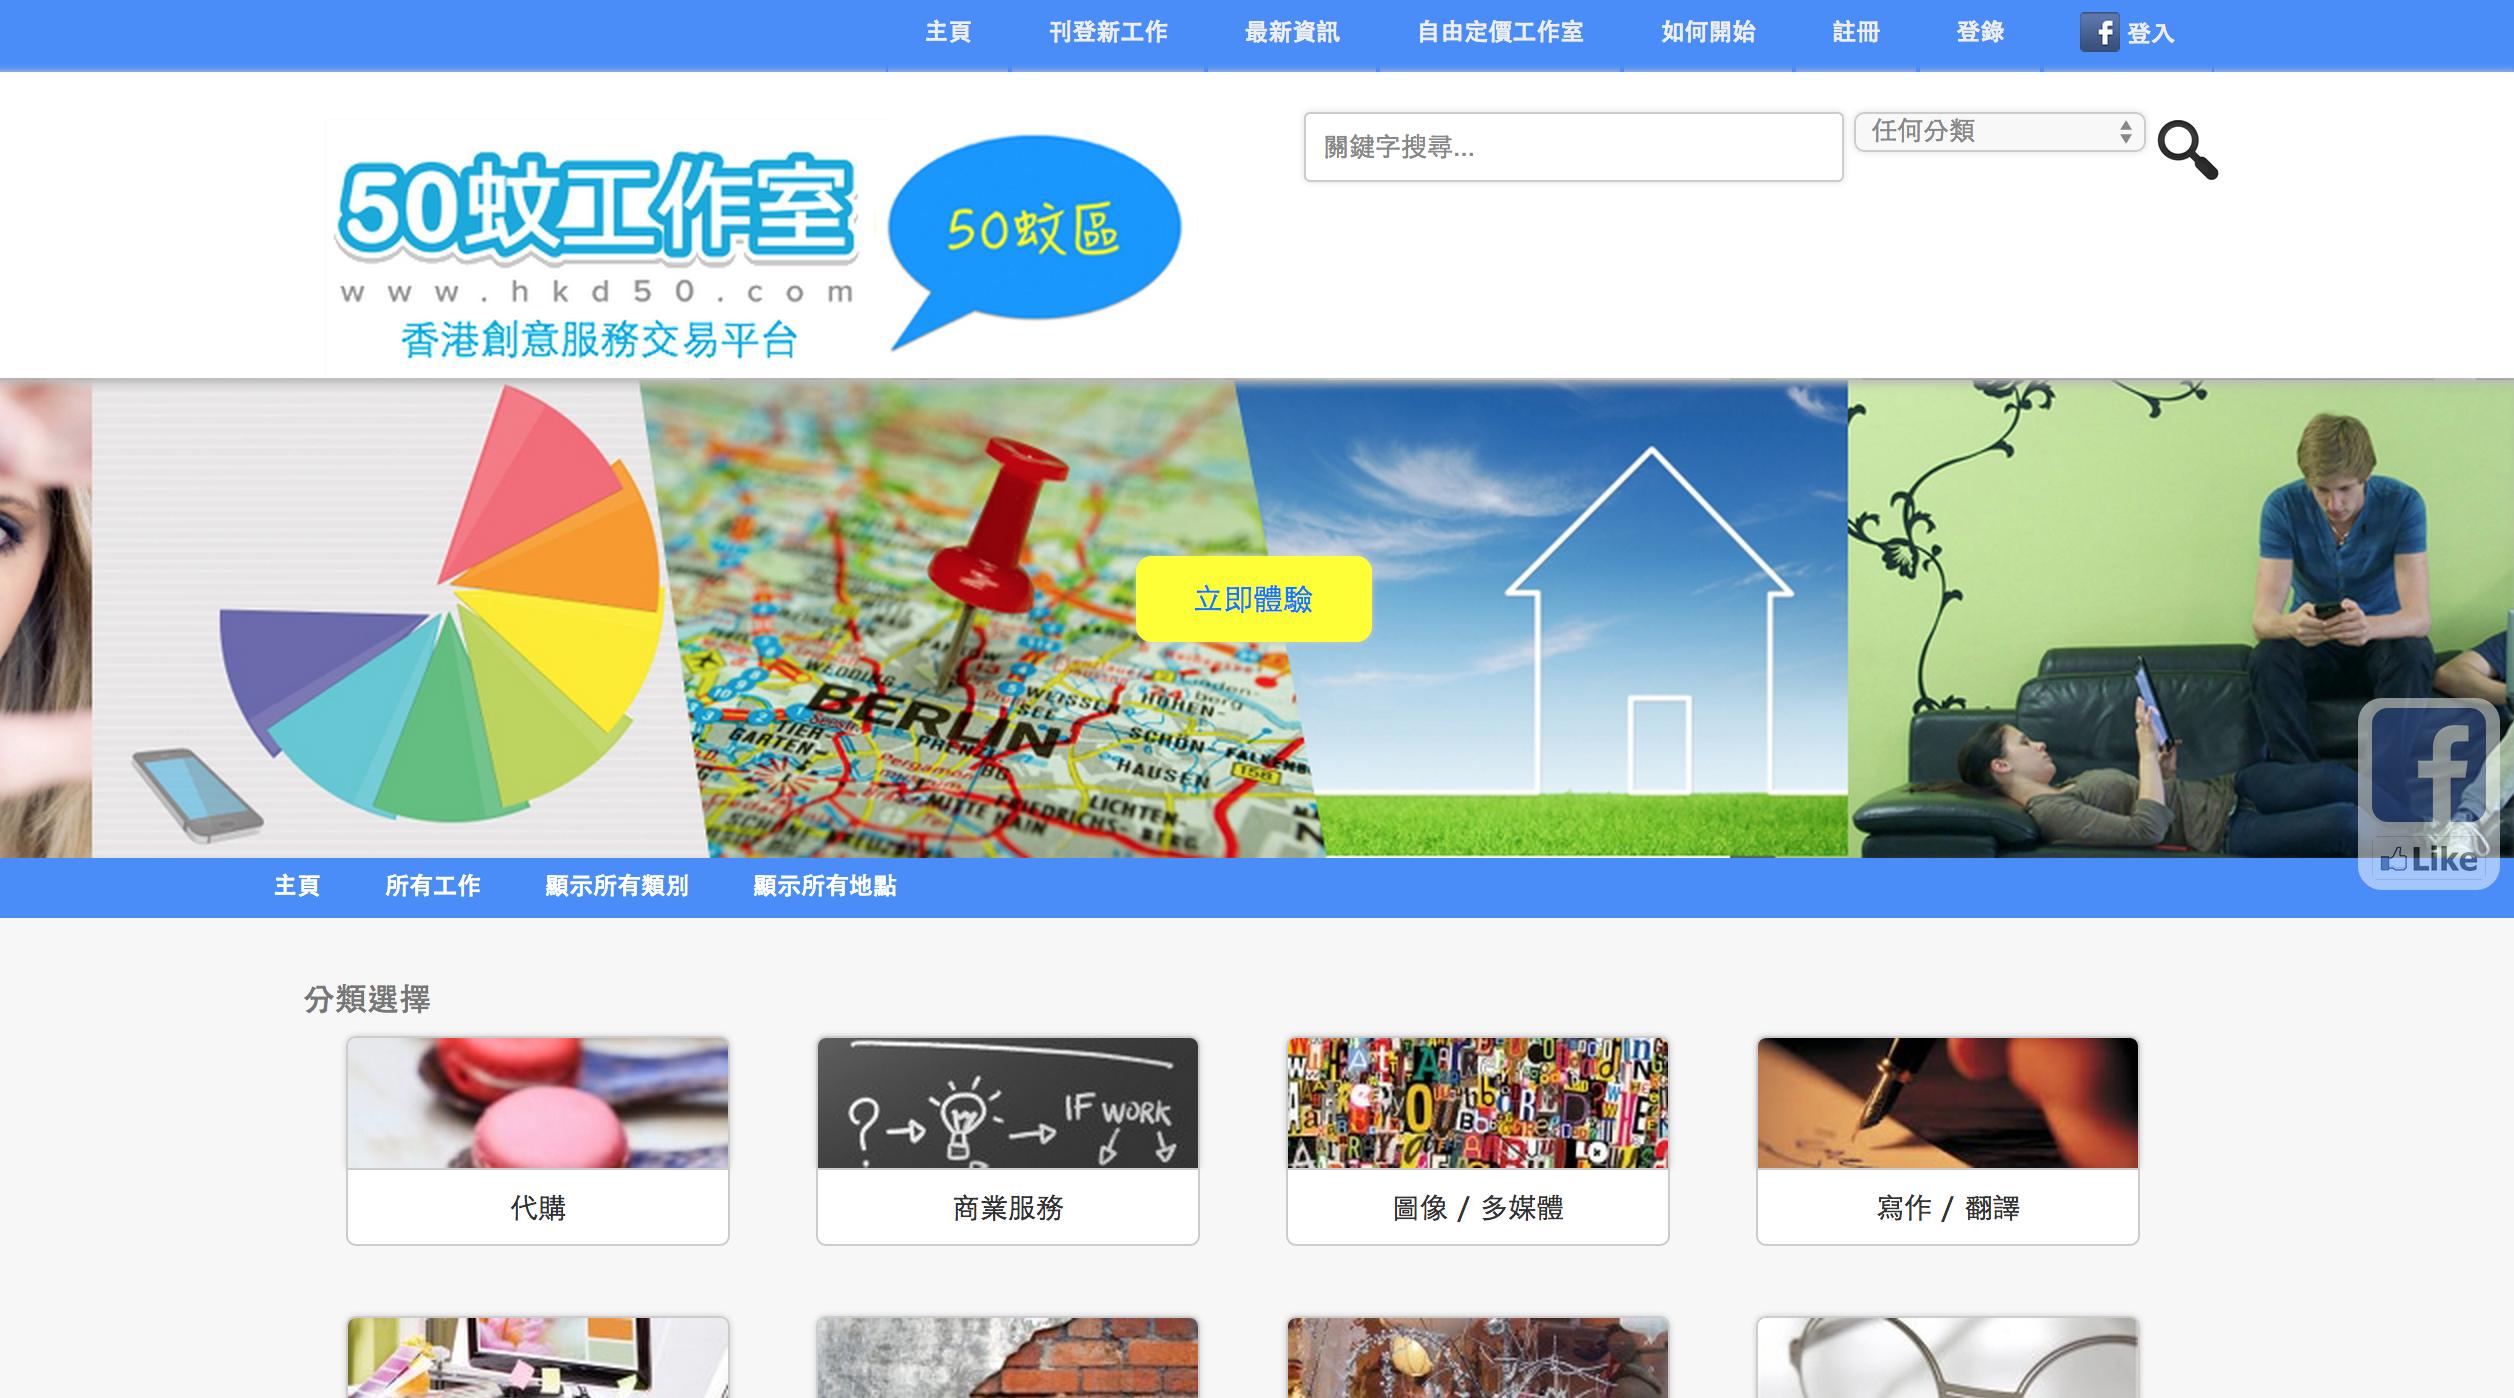 online marketing hkd50